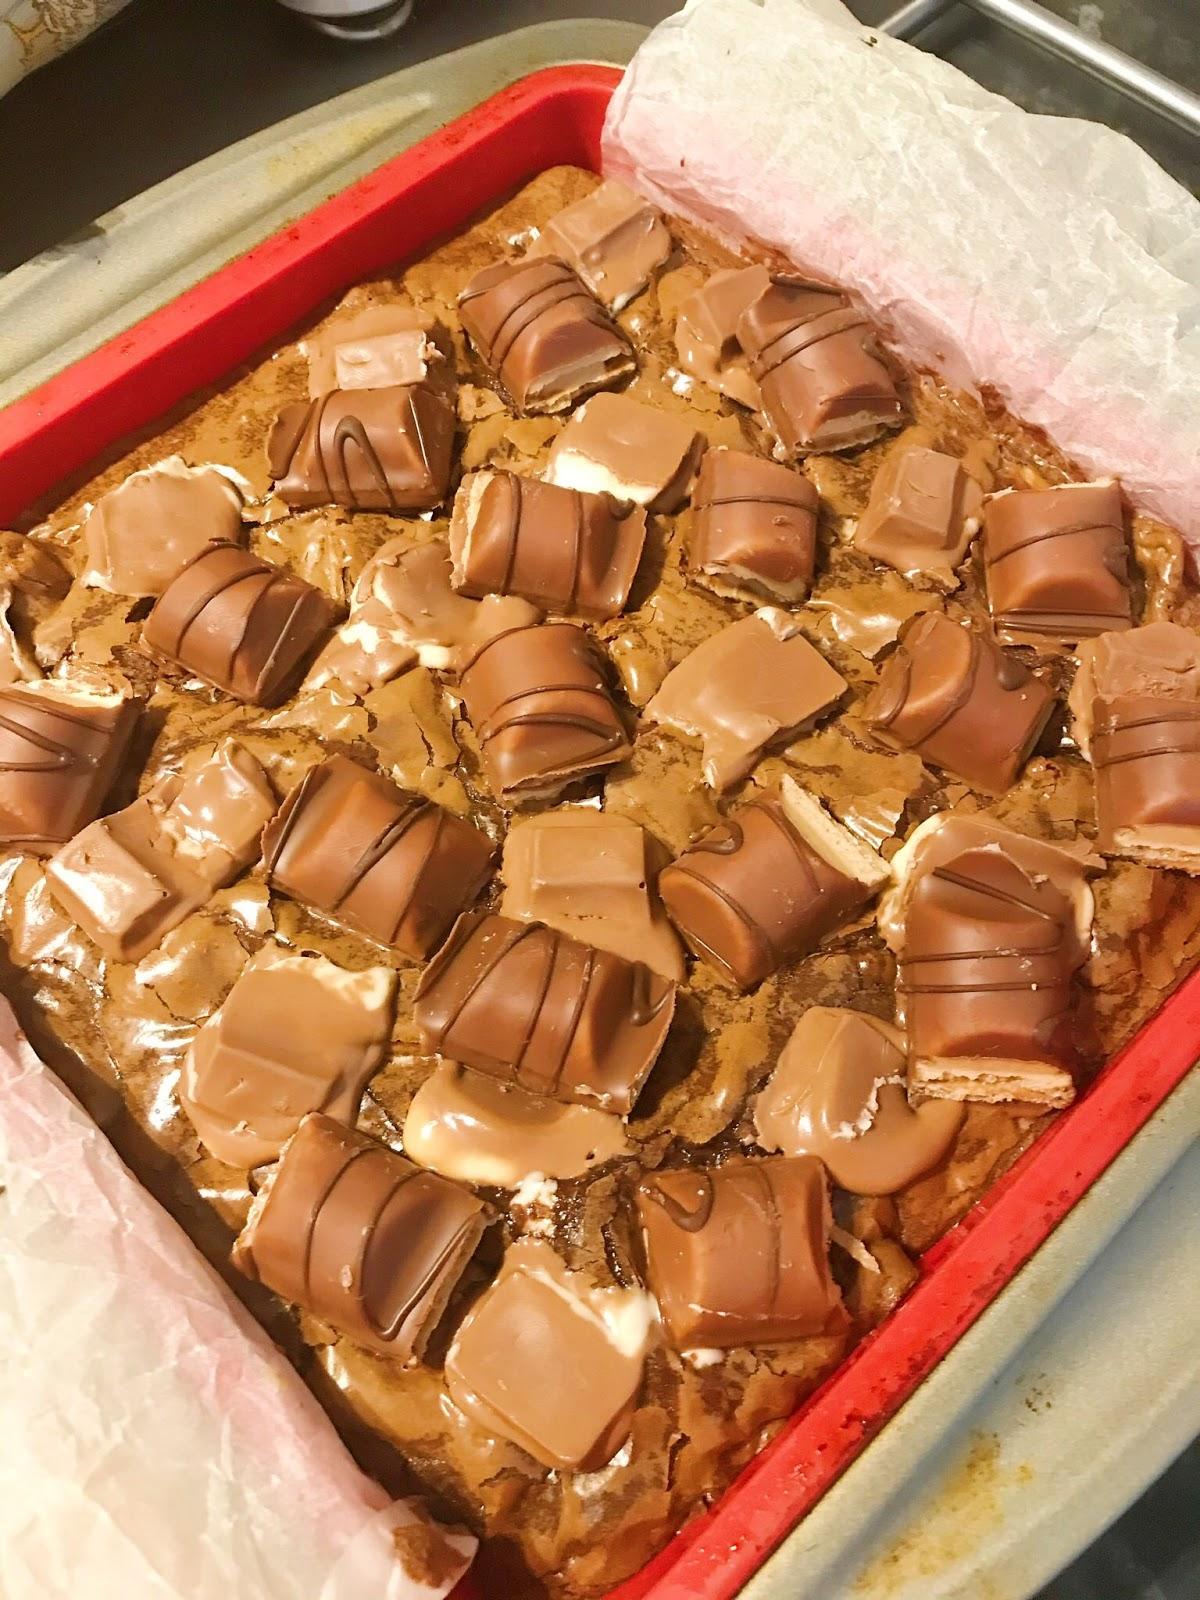 Kinder Bueno brownies in tin halfway through cooking